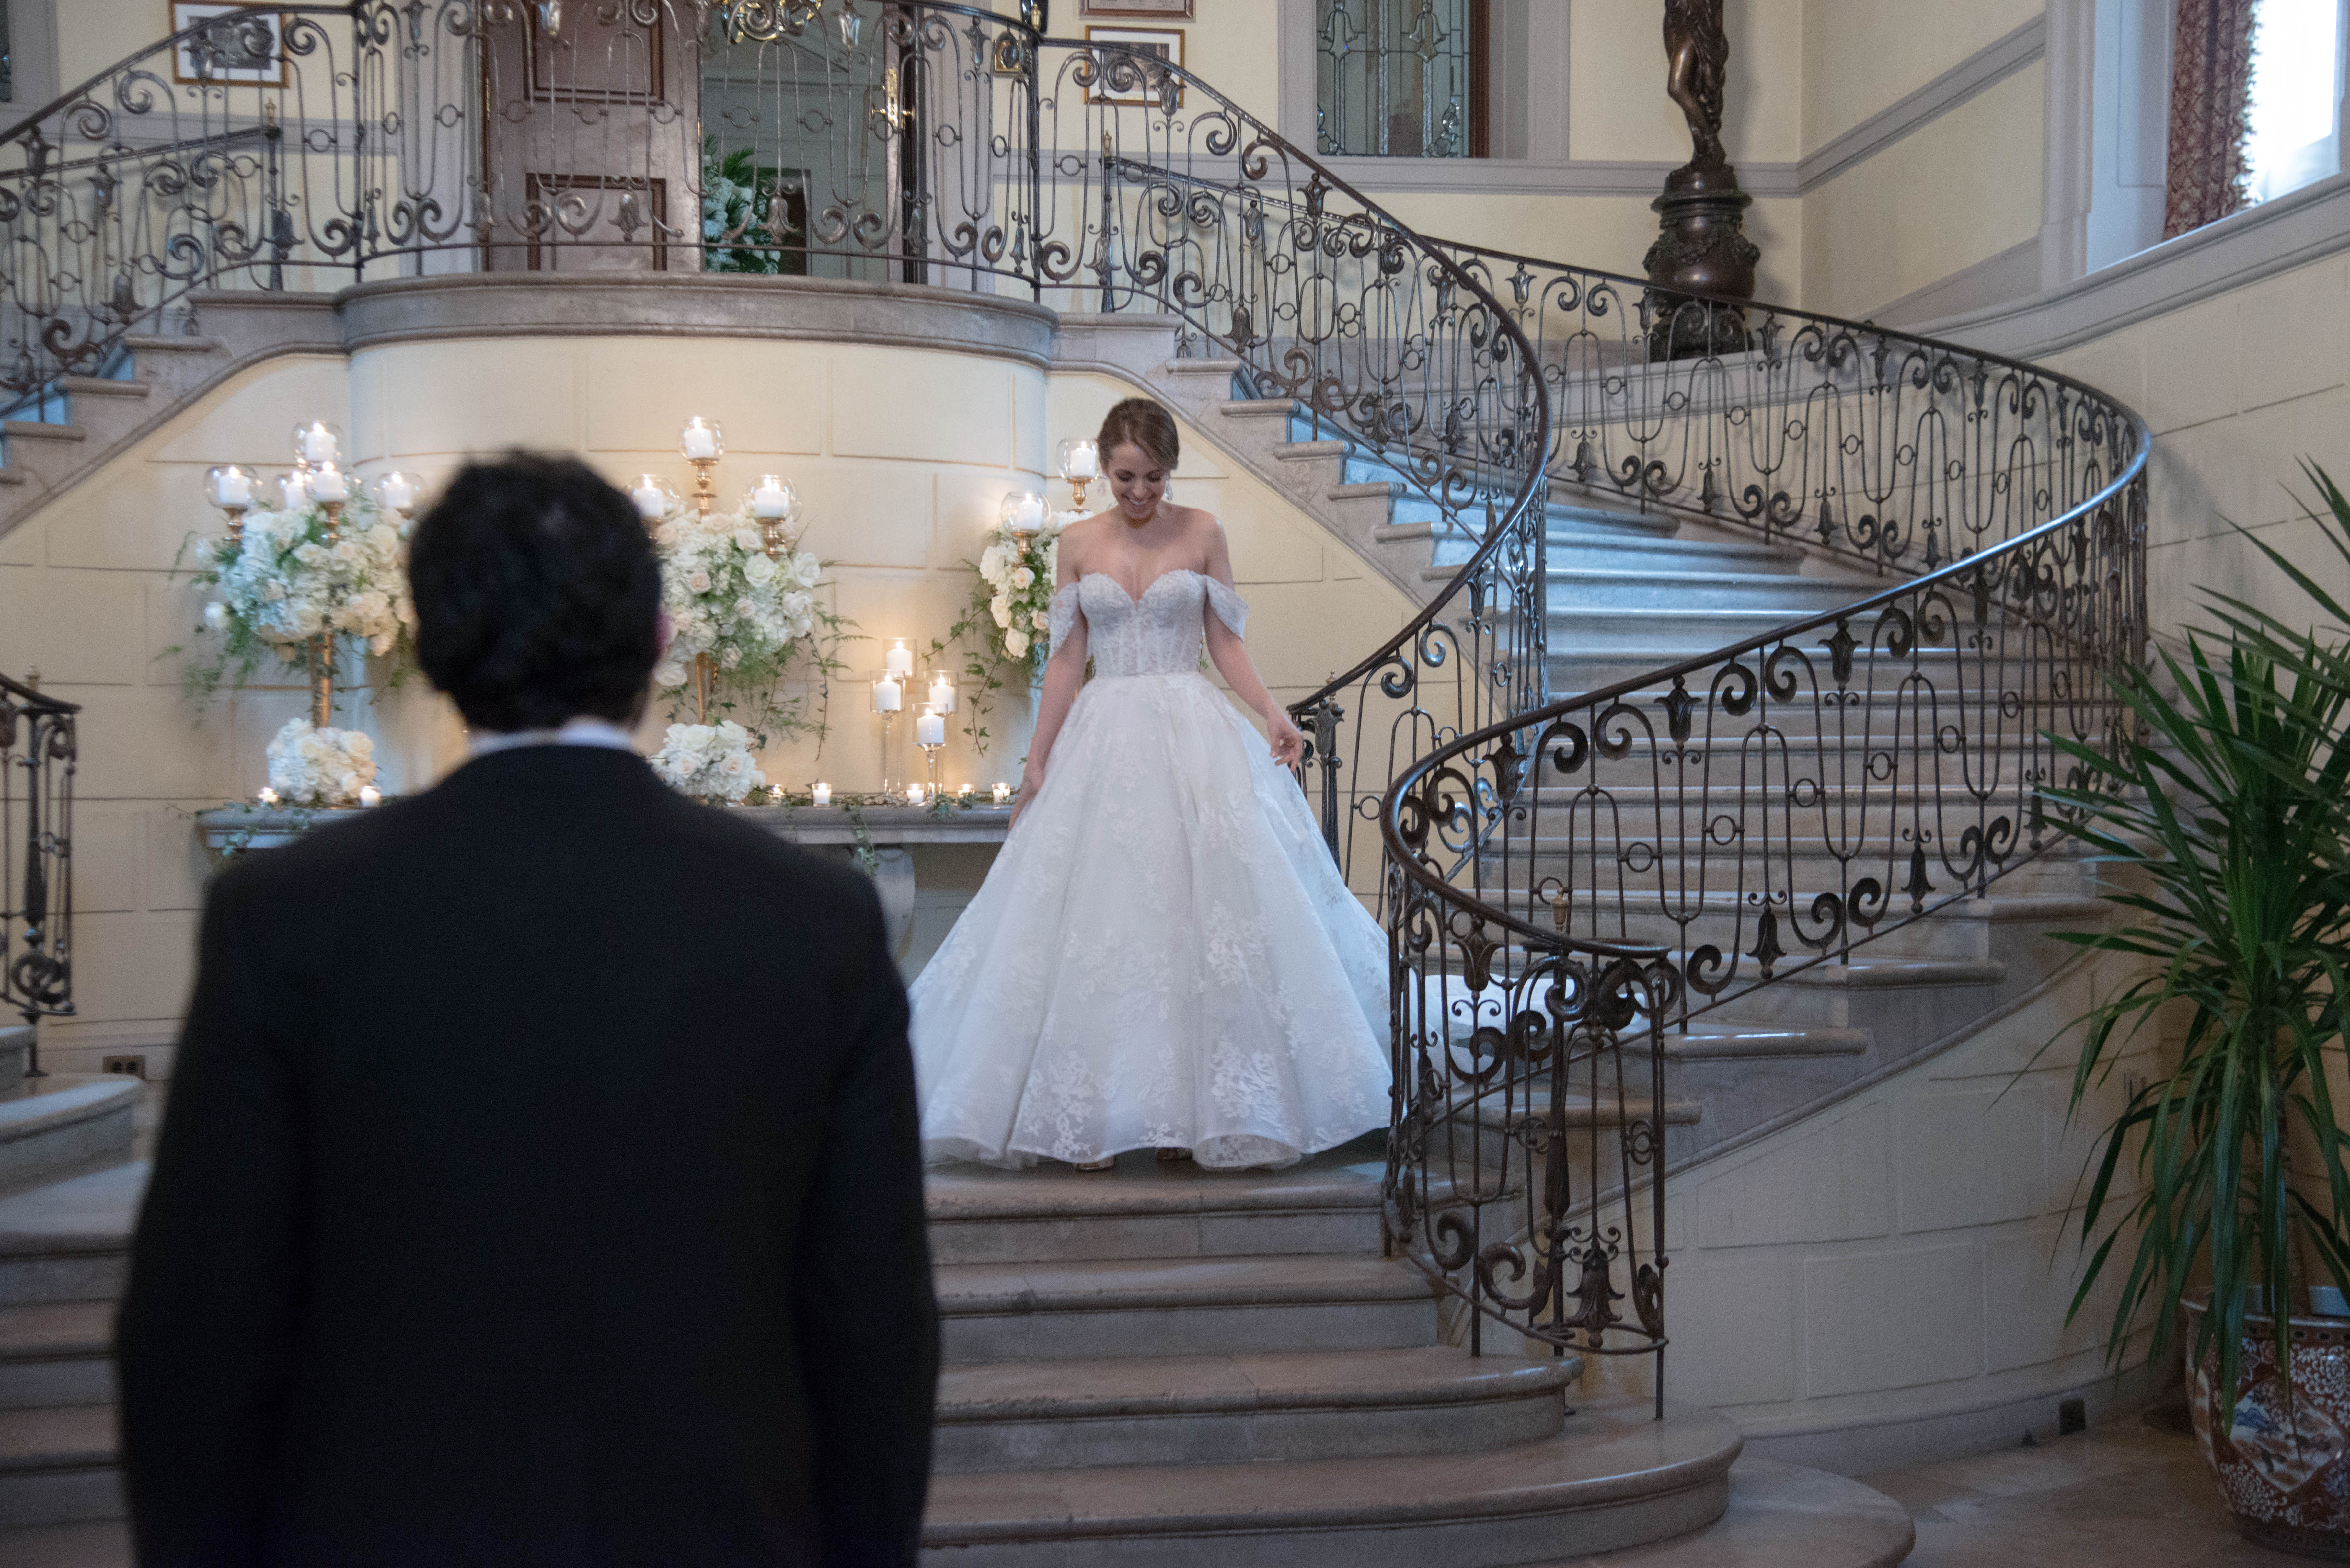 Jedediah Bila's Winter Wedding Album: Exclusive Details